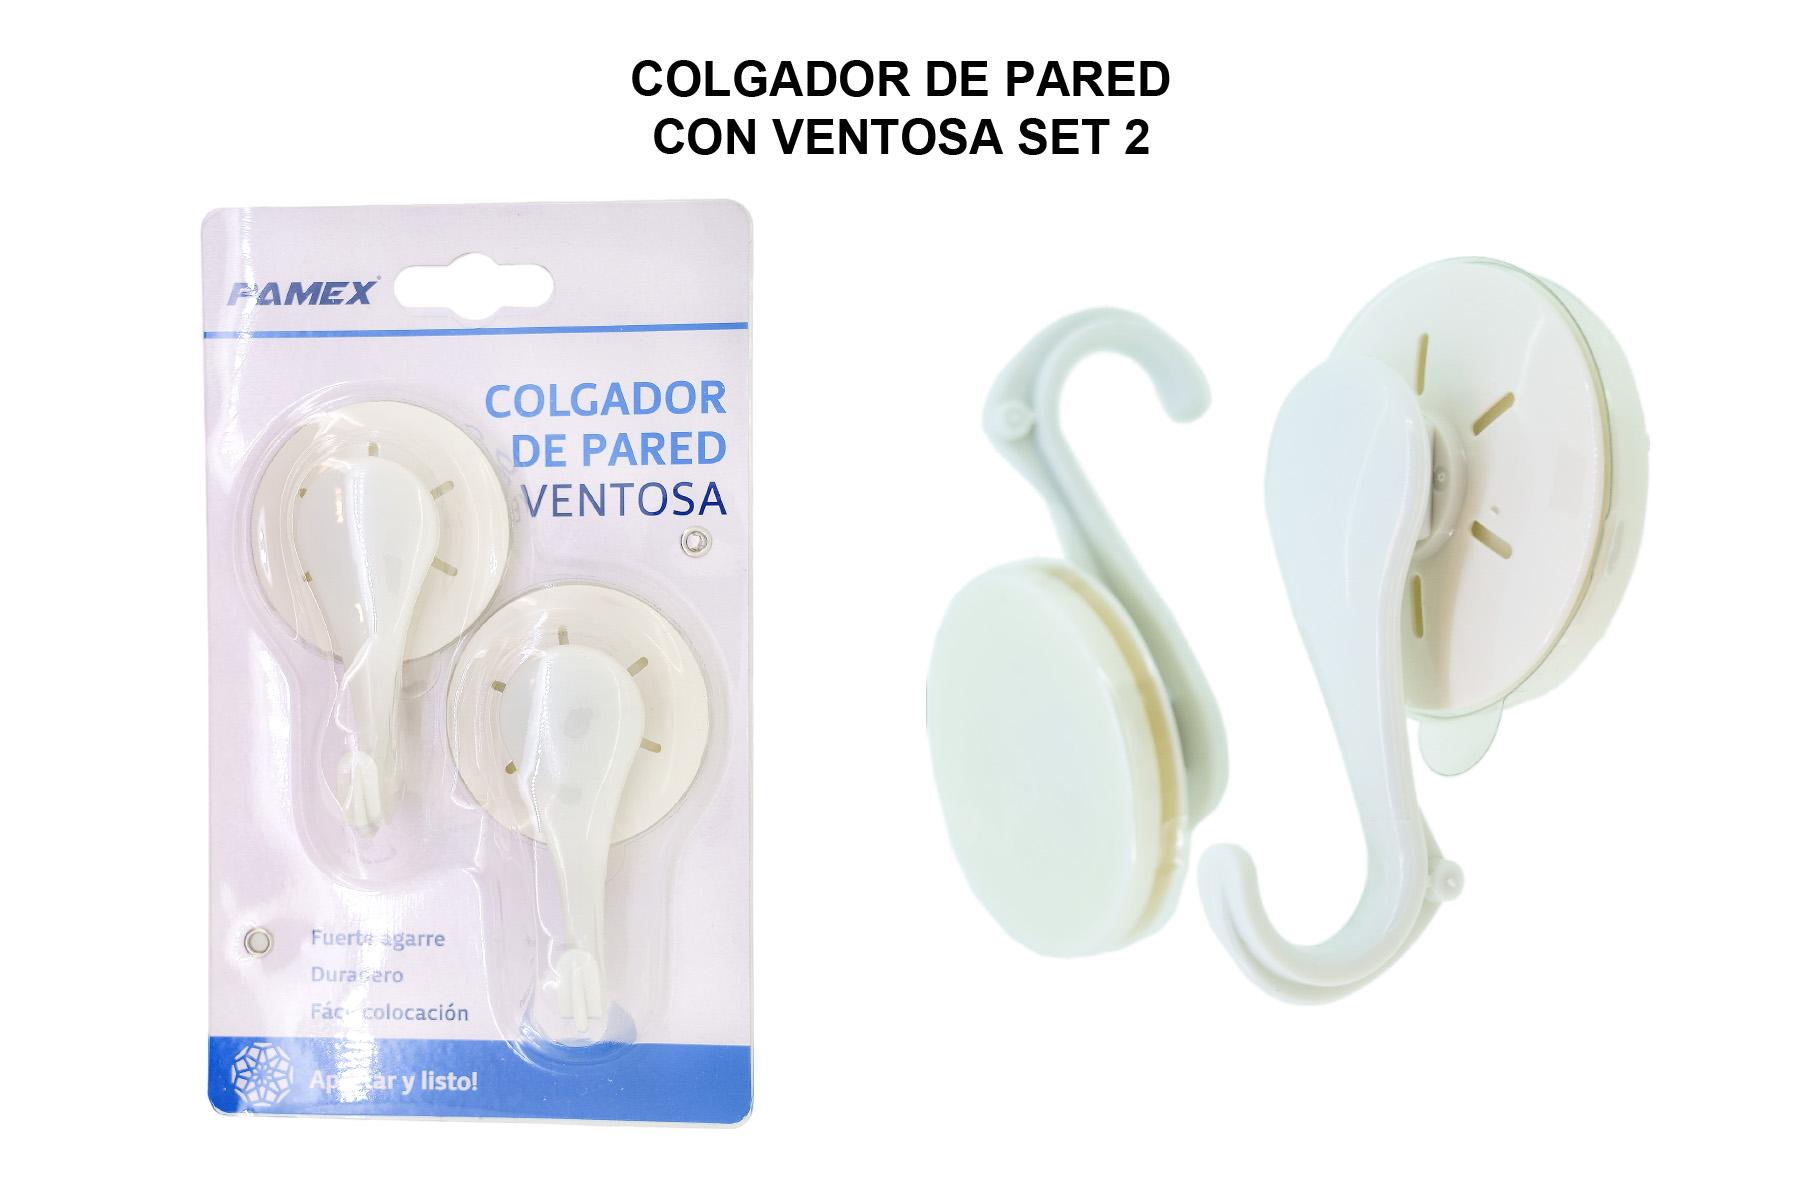 COLGADOR DE PARED CON VENTOSA SET 2